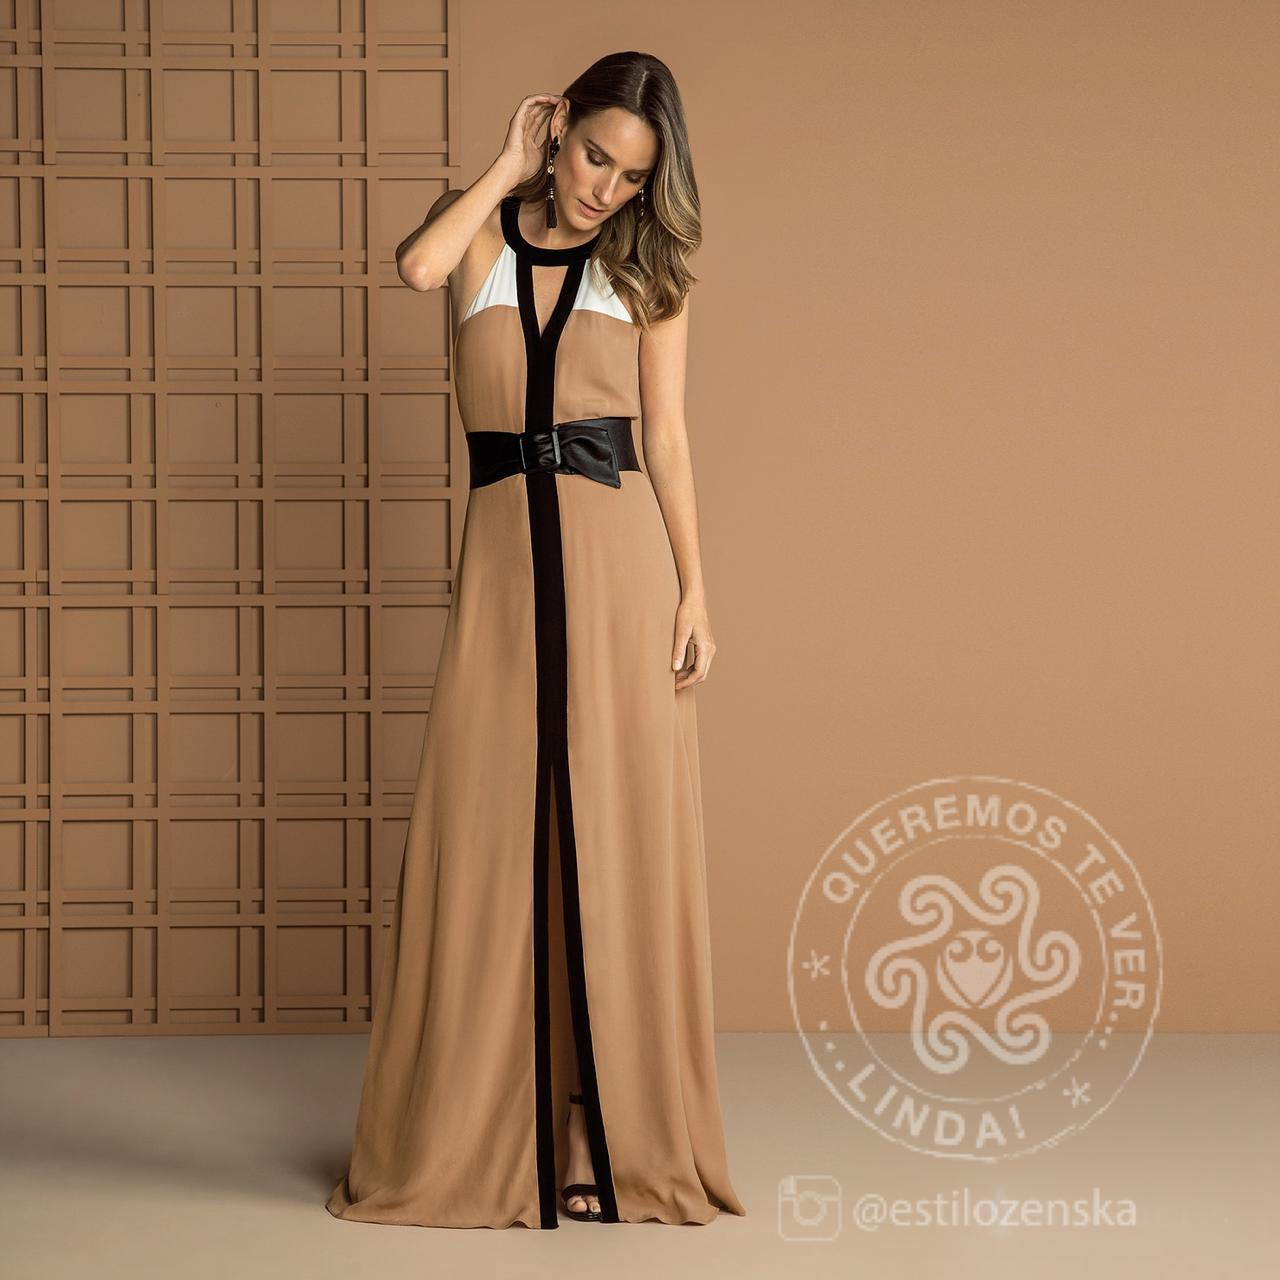 4540f0d22 Buscando por: produtos vestidos vestido 0267601 longo c bordado barra